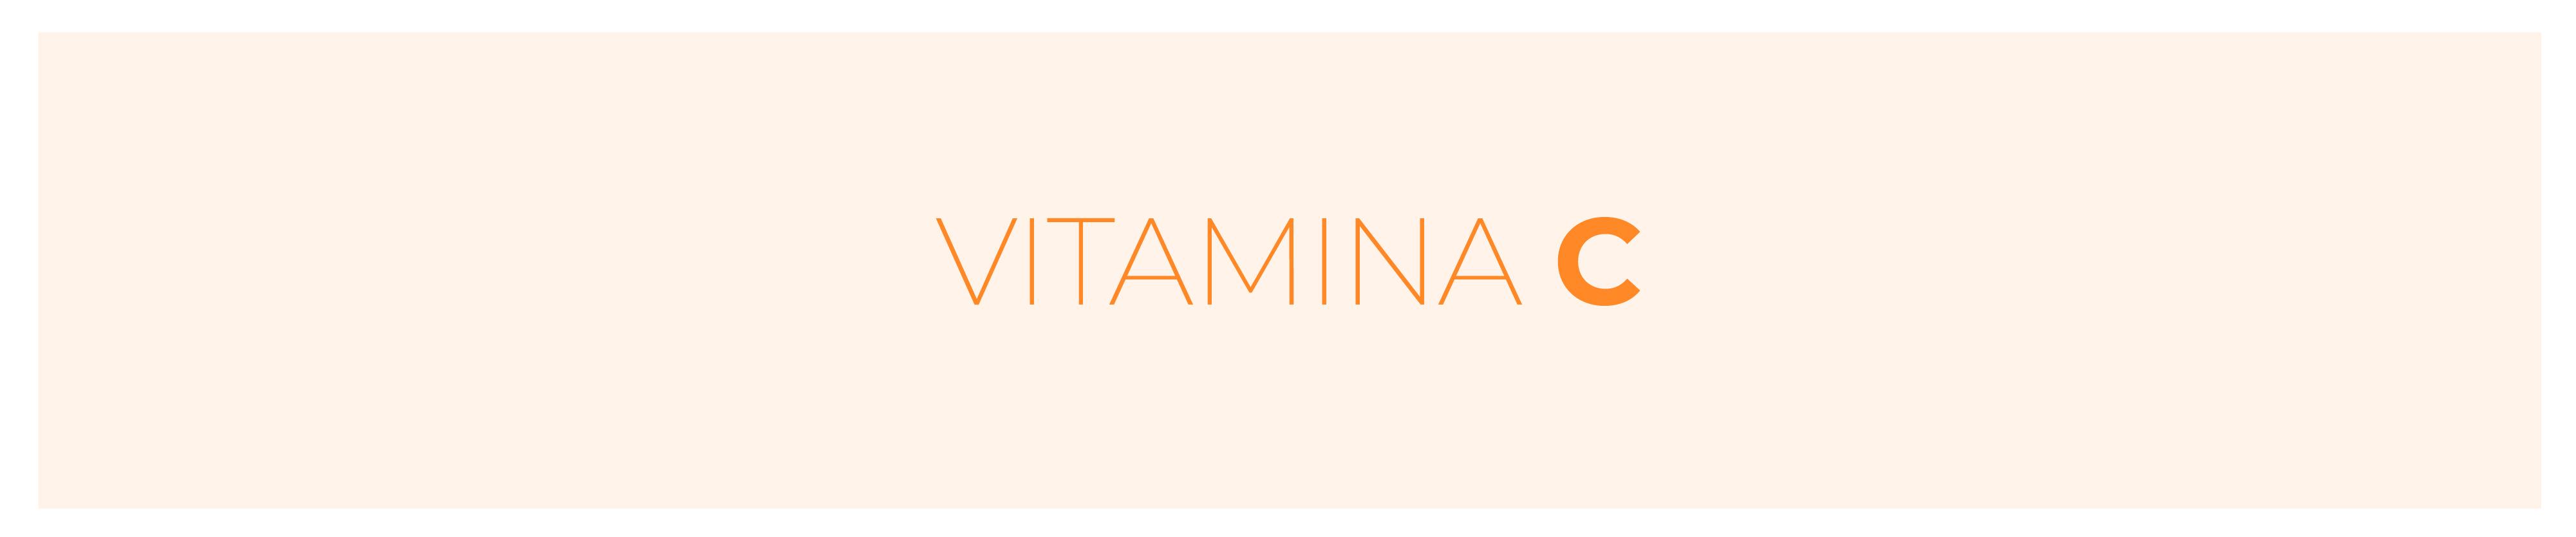 Banner Desktop - Vitamina C